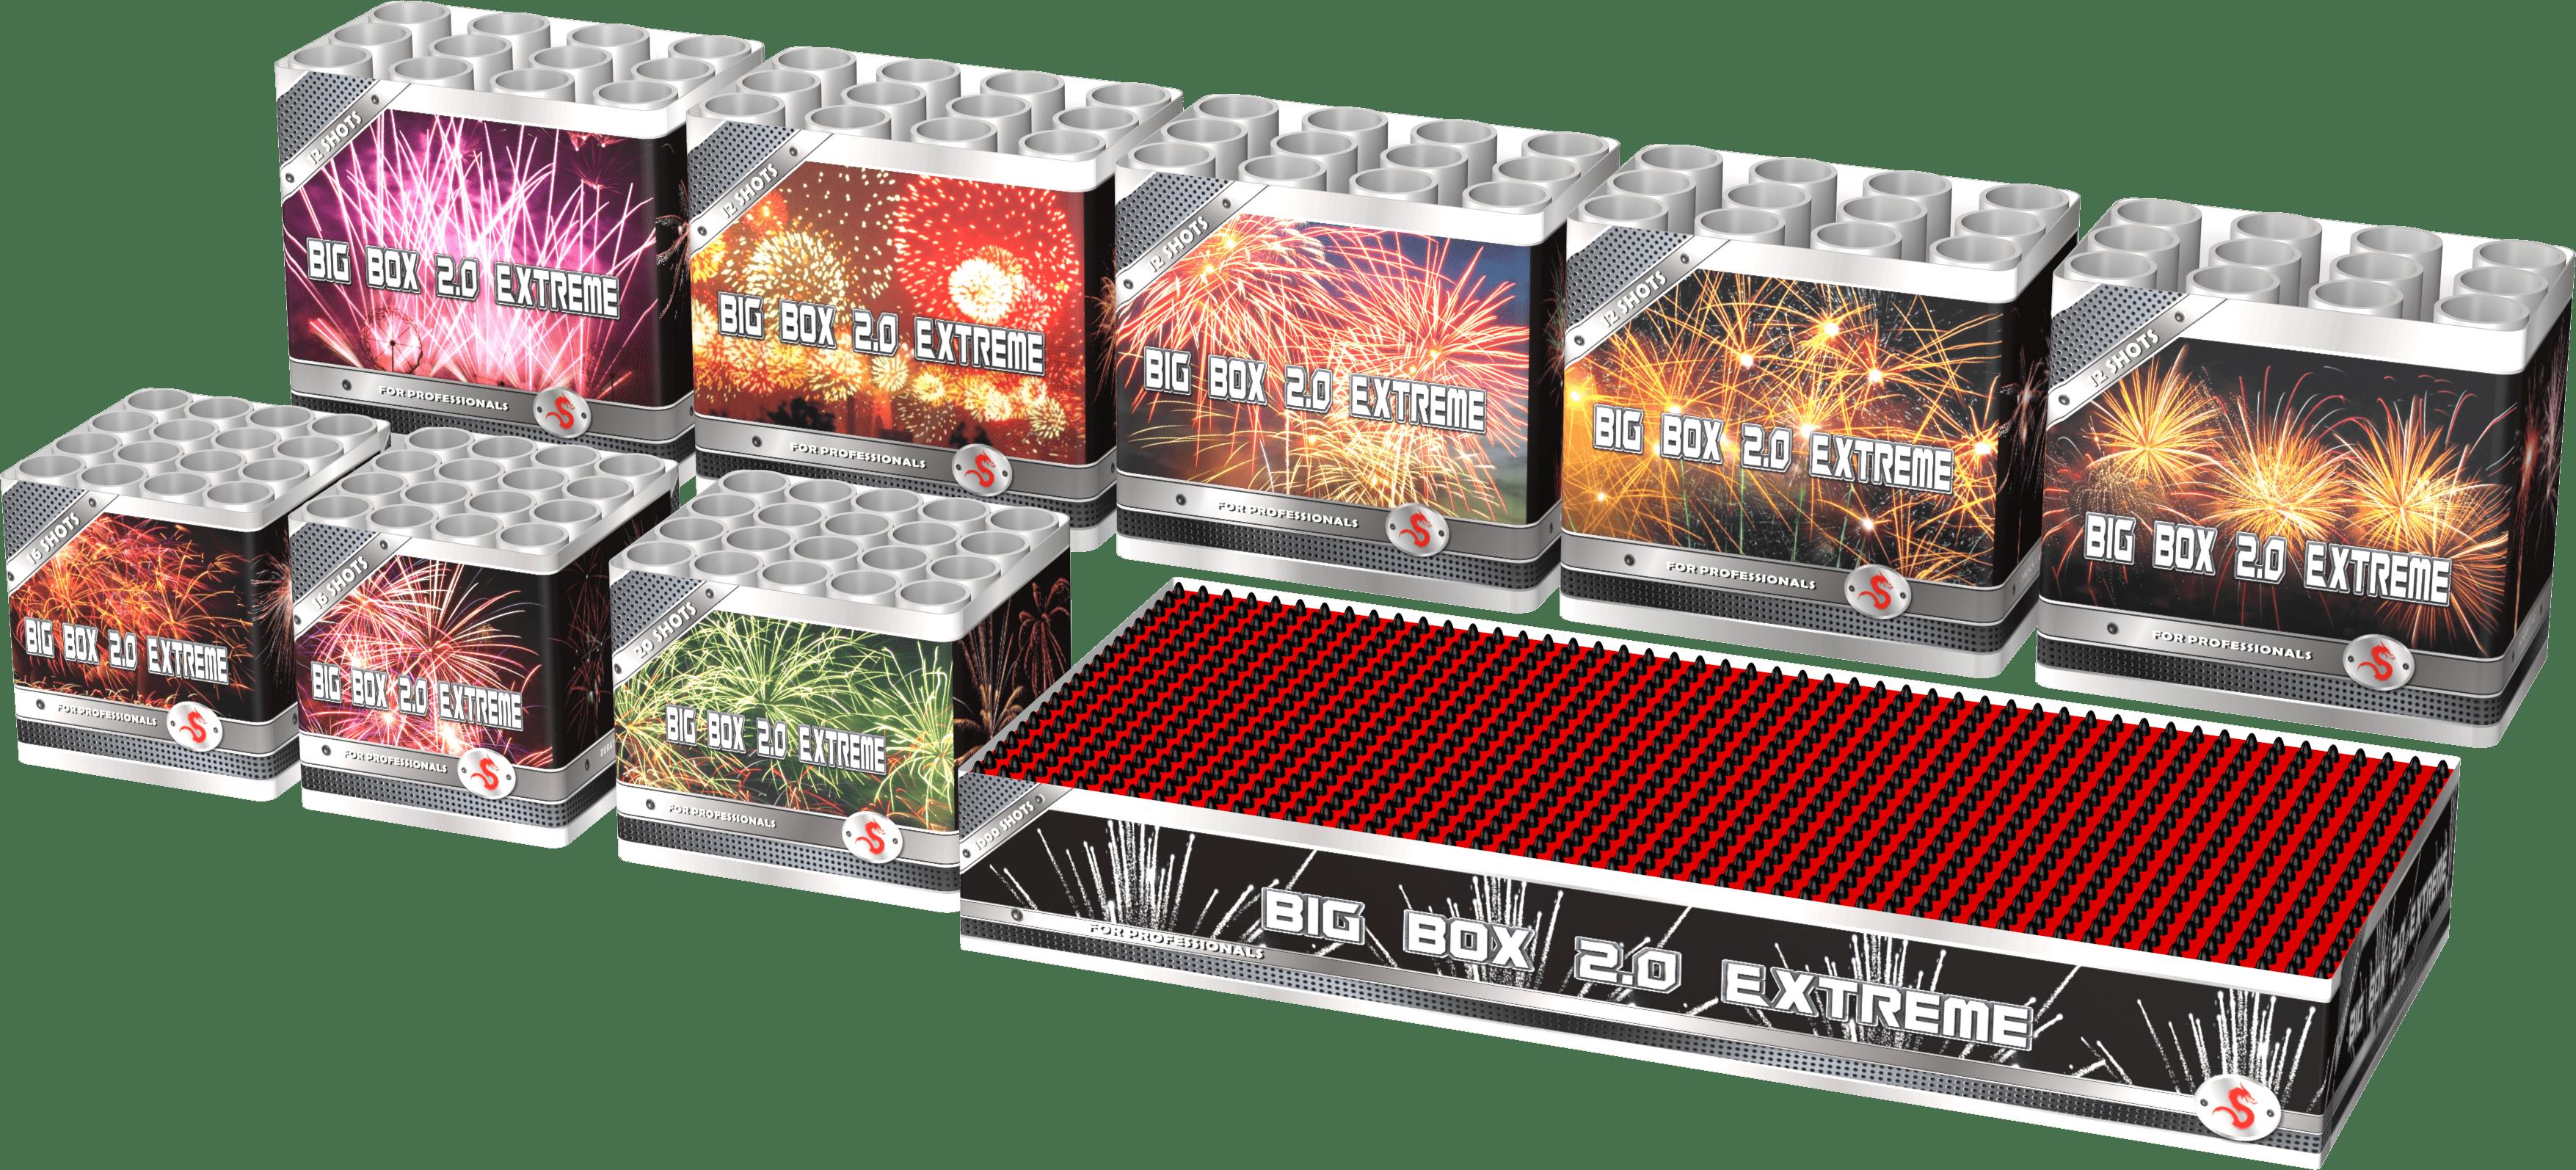 Big box 2.0 Extreme pakket